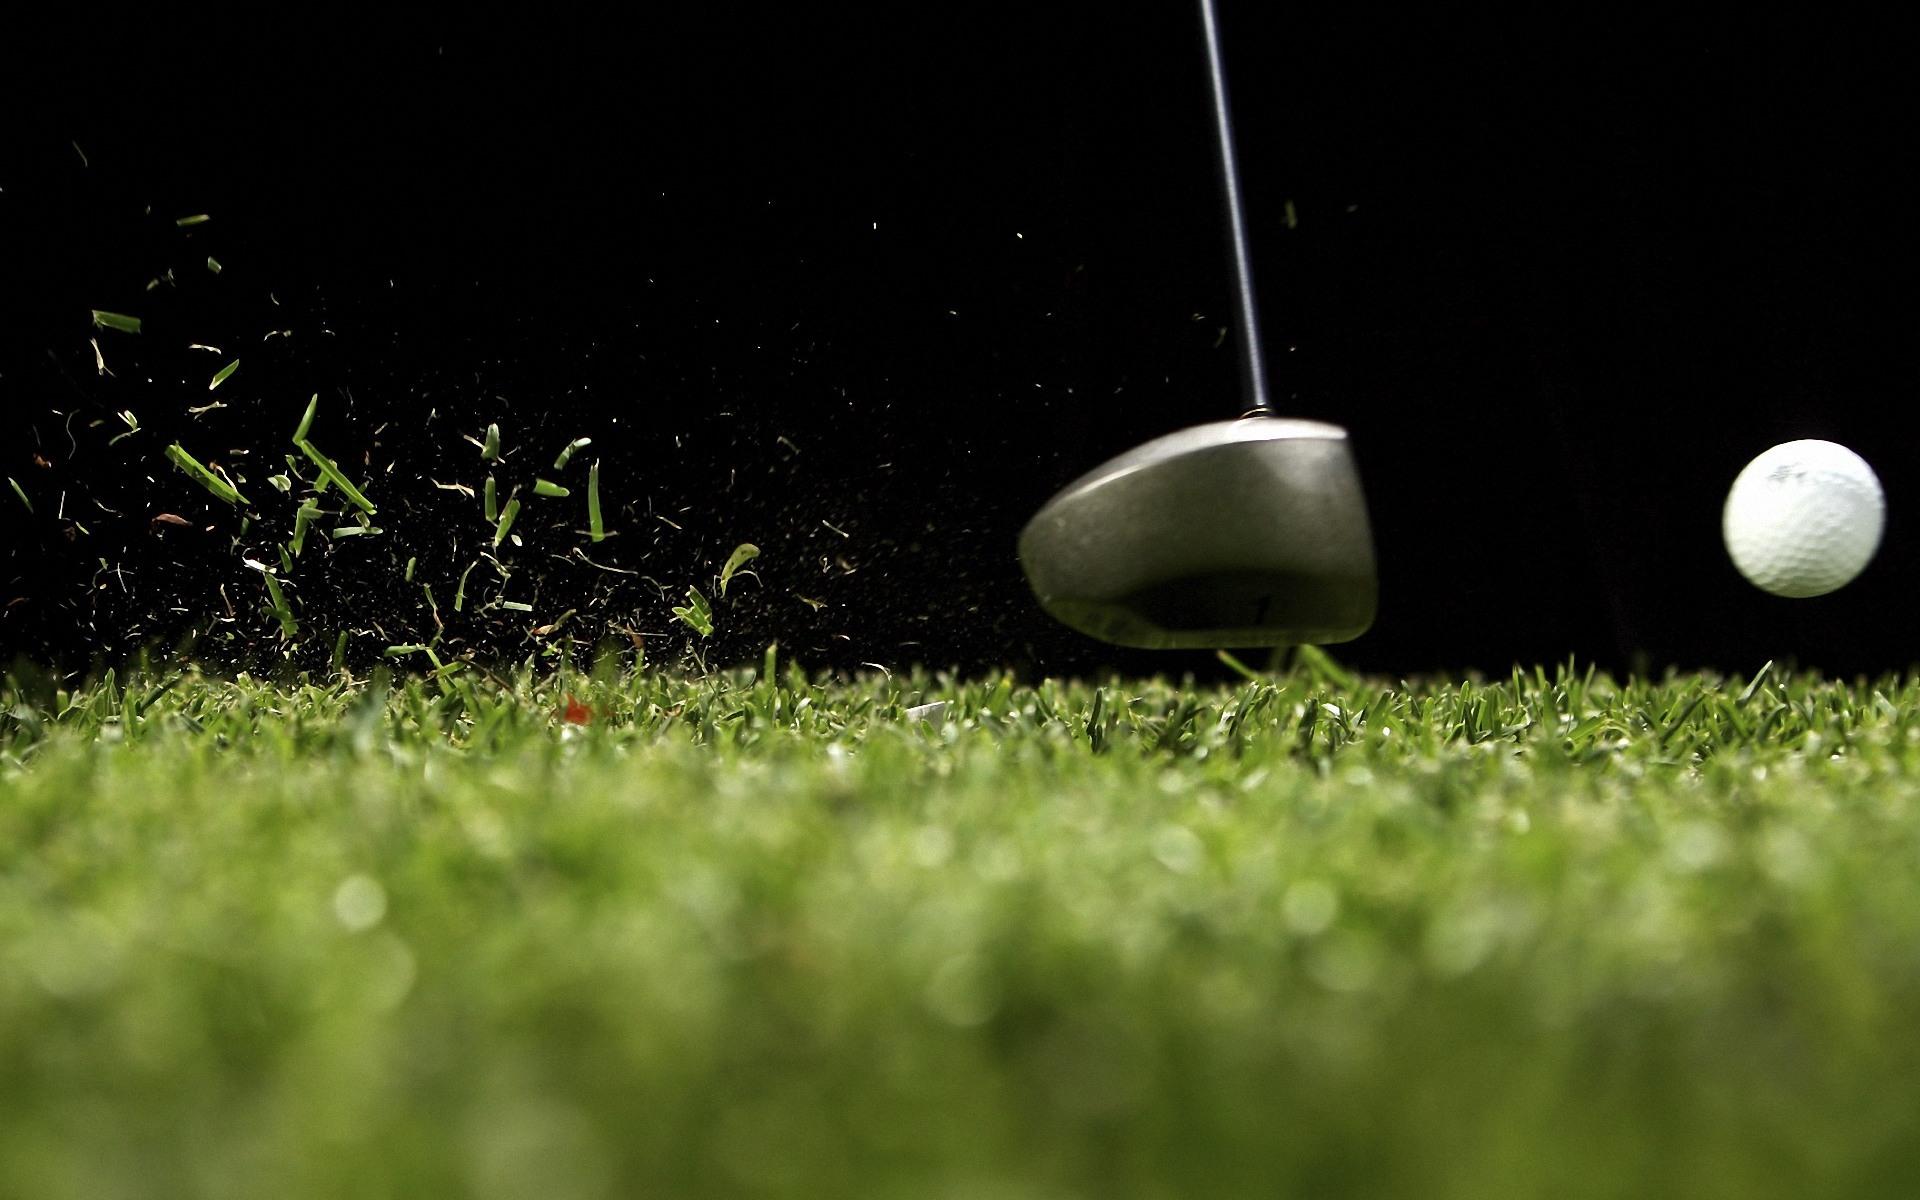 Free Golf Png Hd Download Transparent Golf Hd Downloadpng